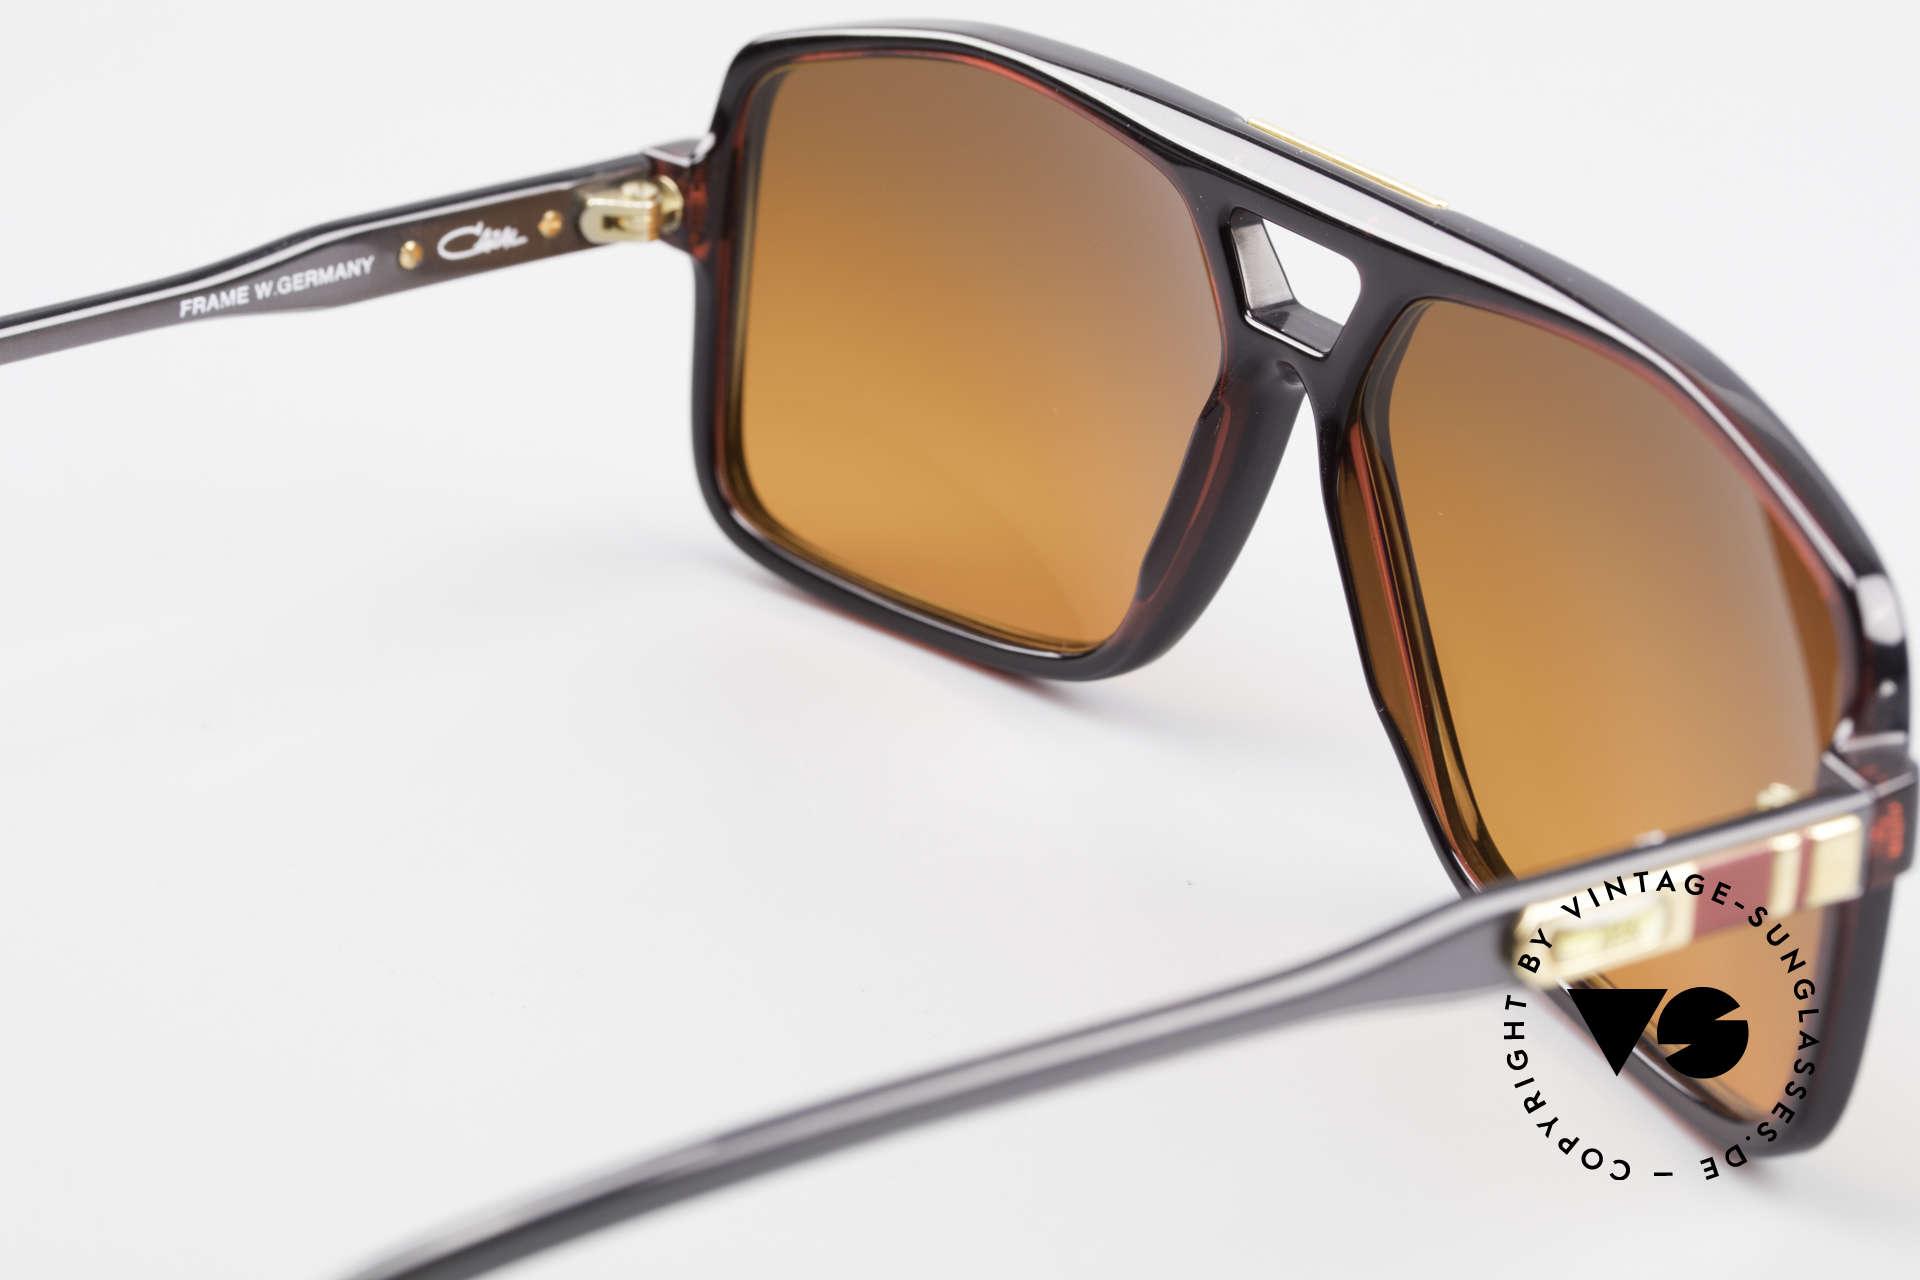 Cazal 637 80's Hip Hop Shades Sunset, fancy customized sun lenses in sunset red-orange, Made for Men